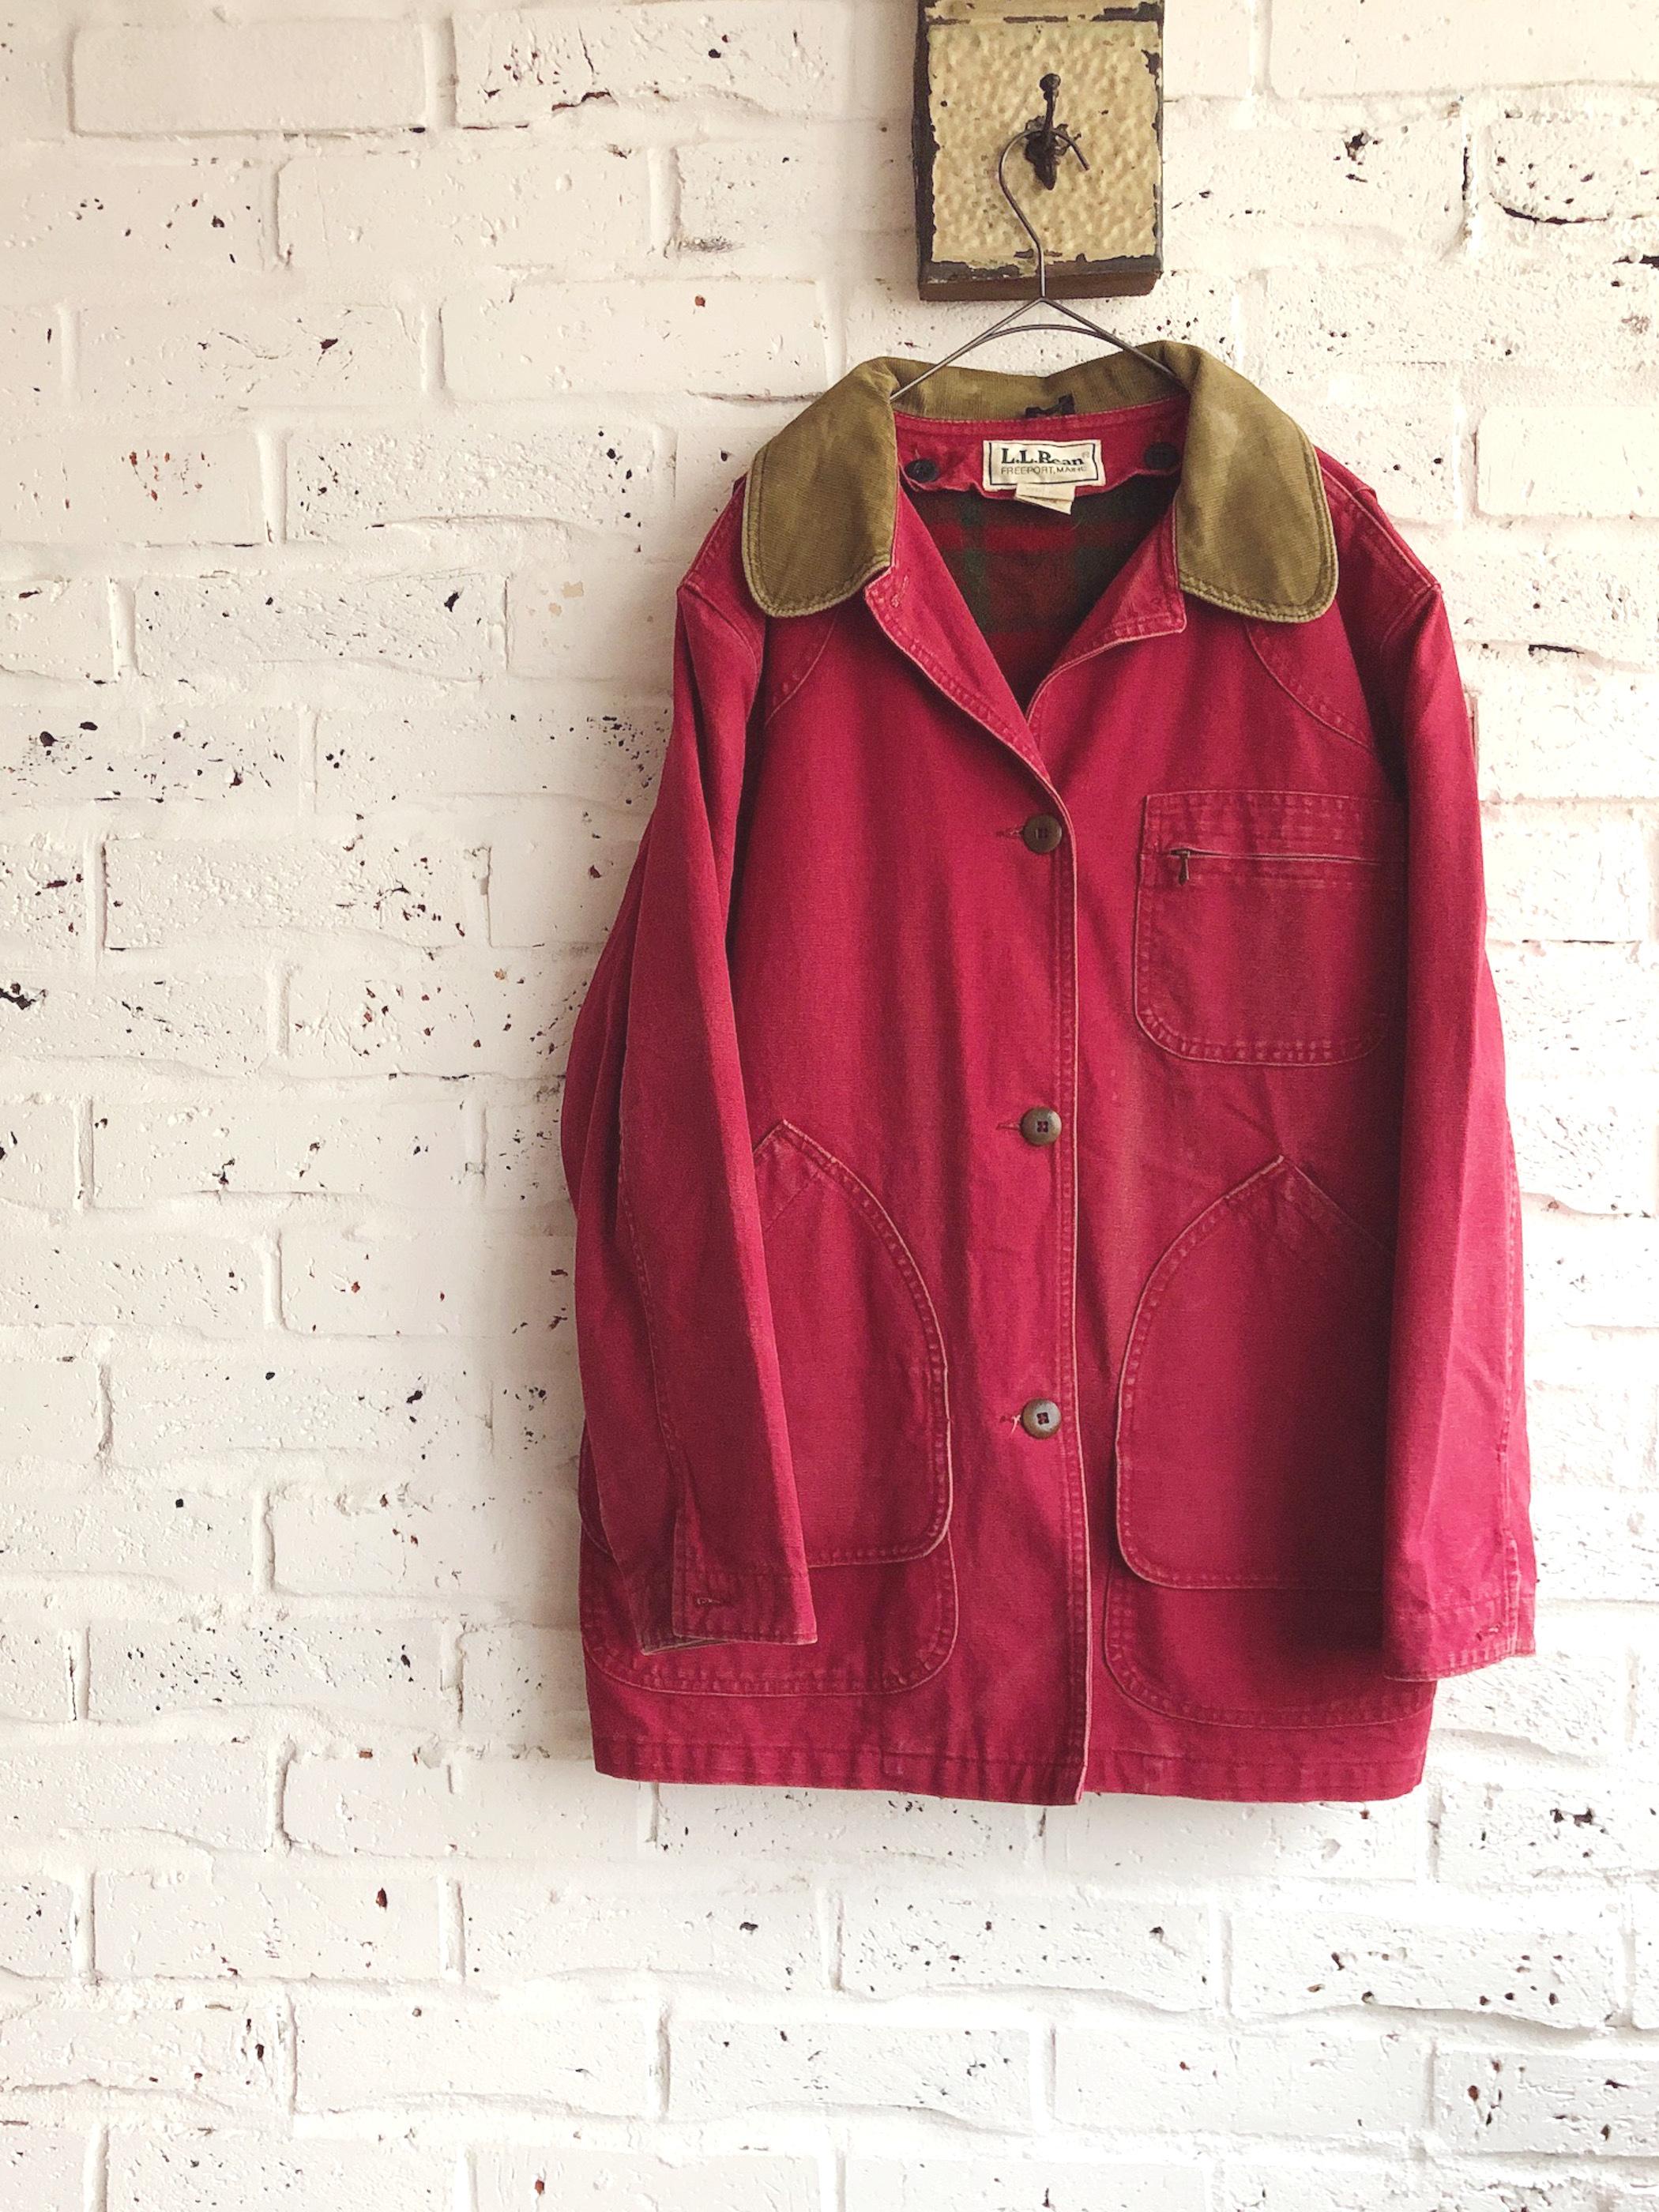 Vintage 80's USA《L.L.Bean》Hunting Jacket